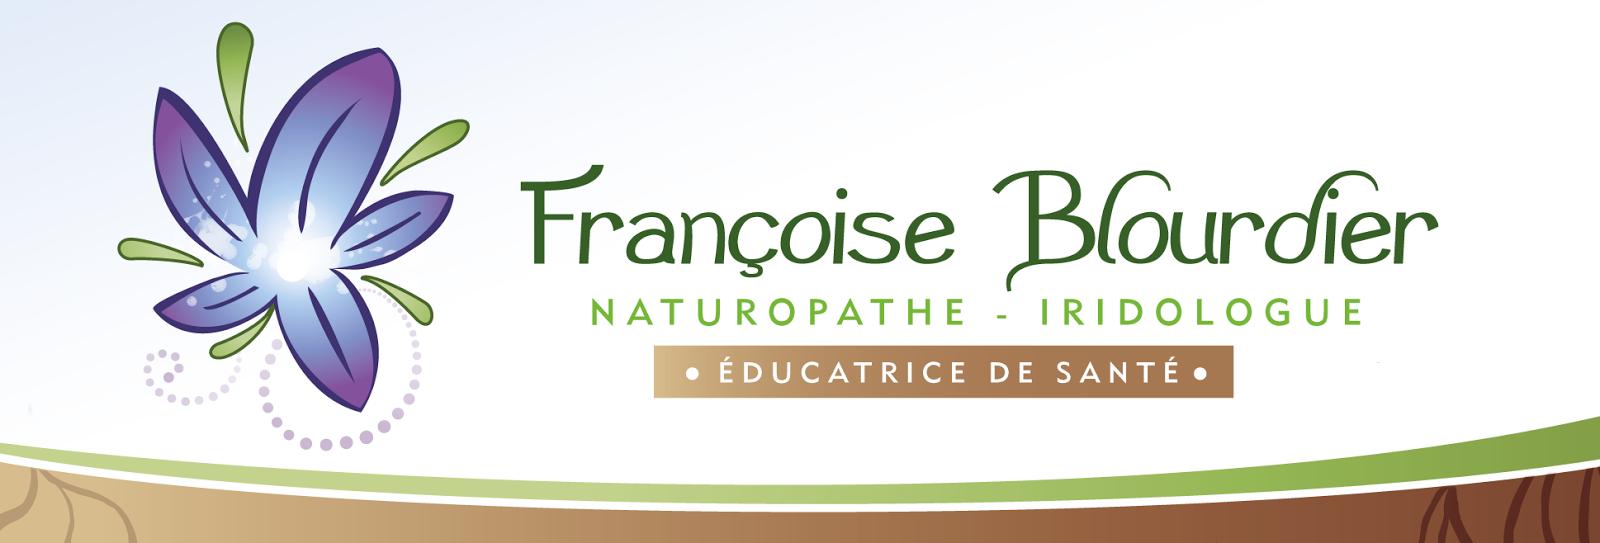 Françoise Blourdier - Naturopathe-iridologue